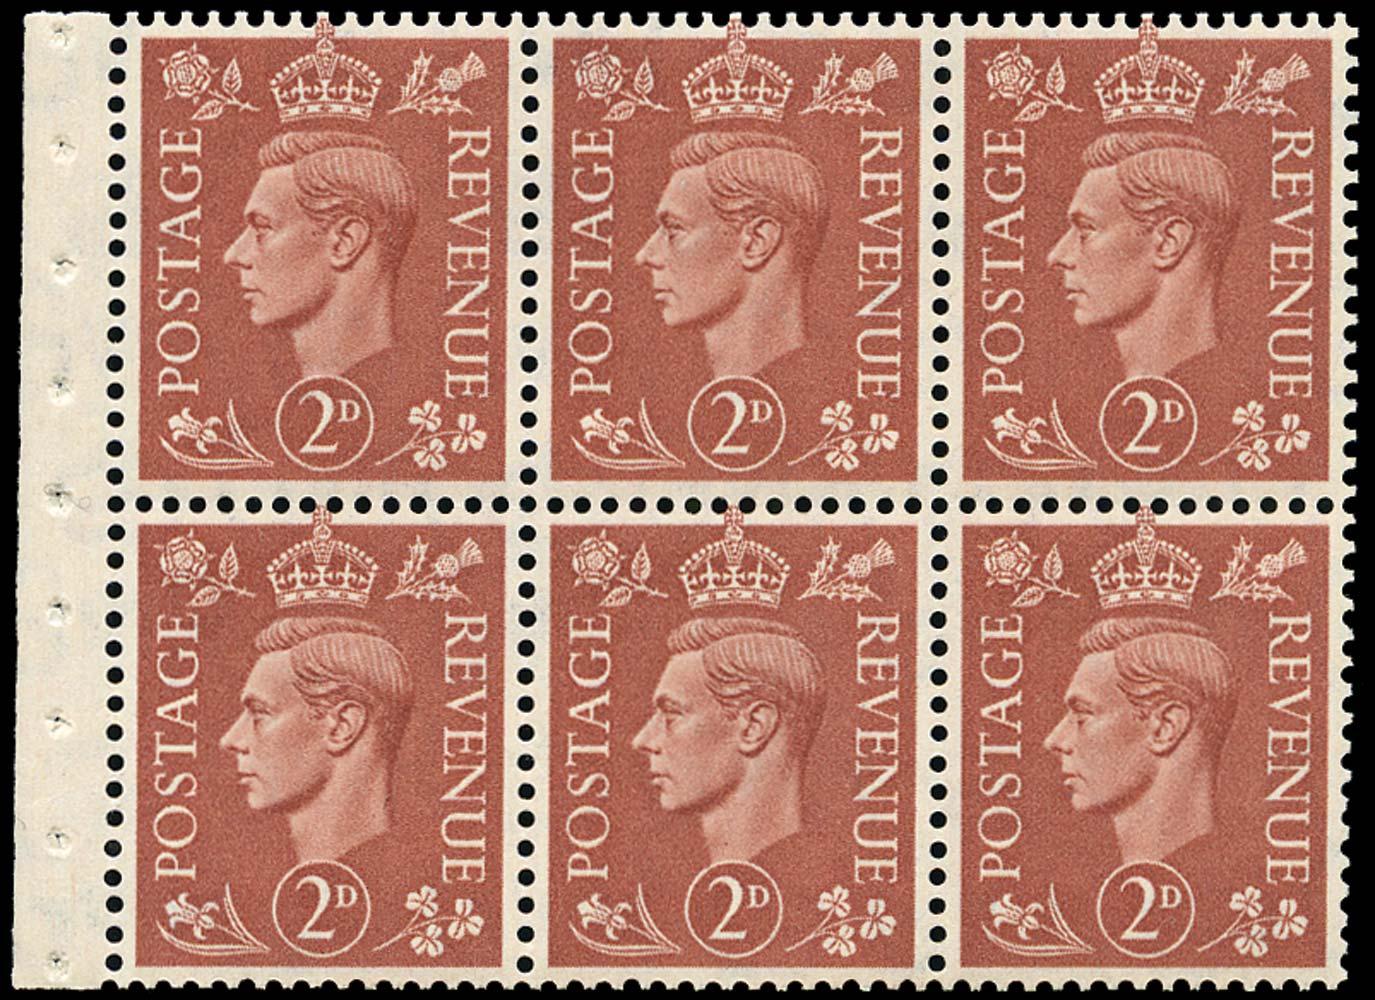 GB 1951  SG506l Booklet pane of six, U/M